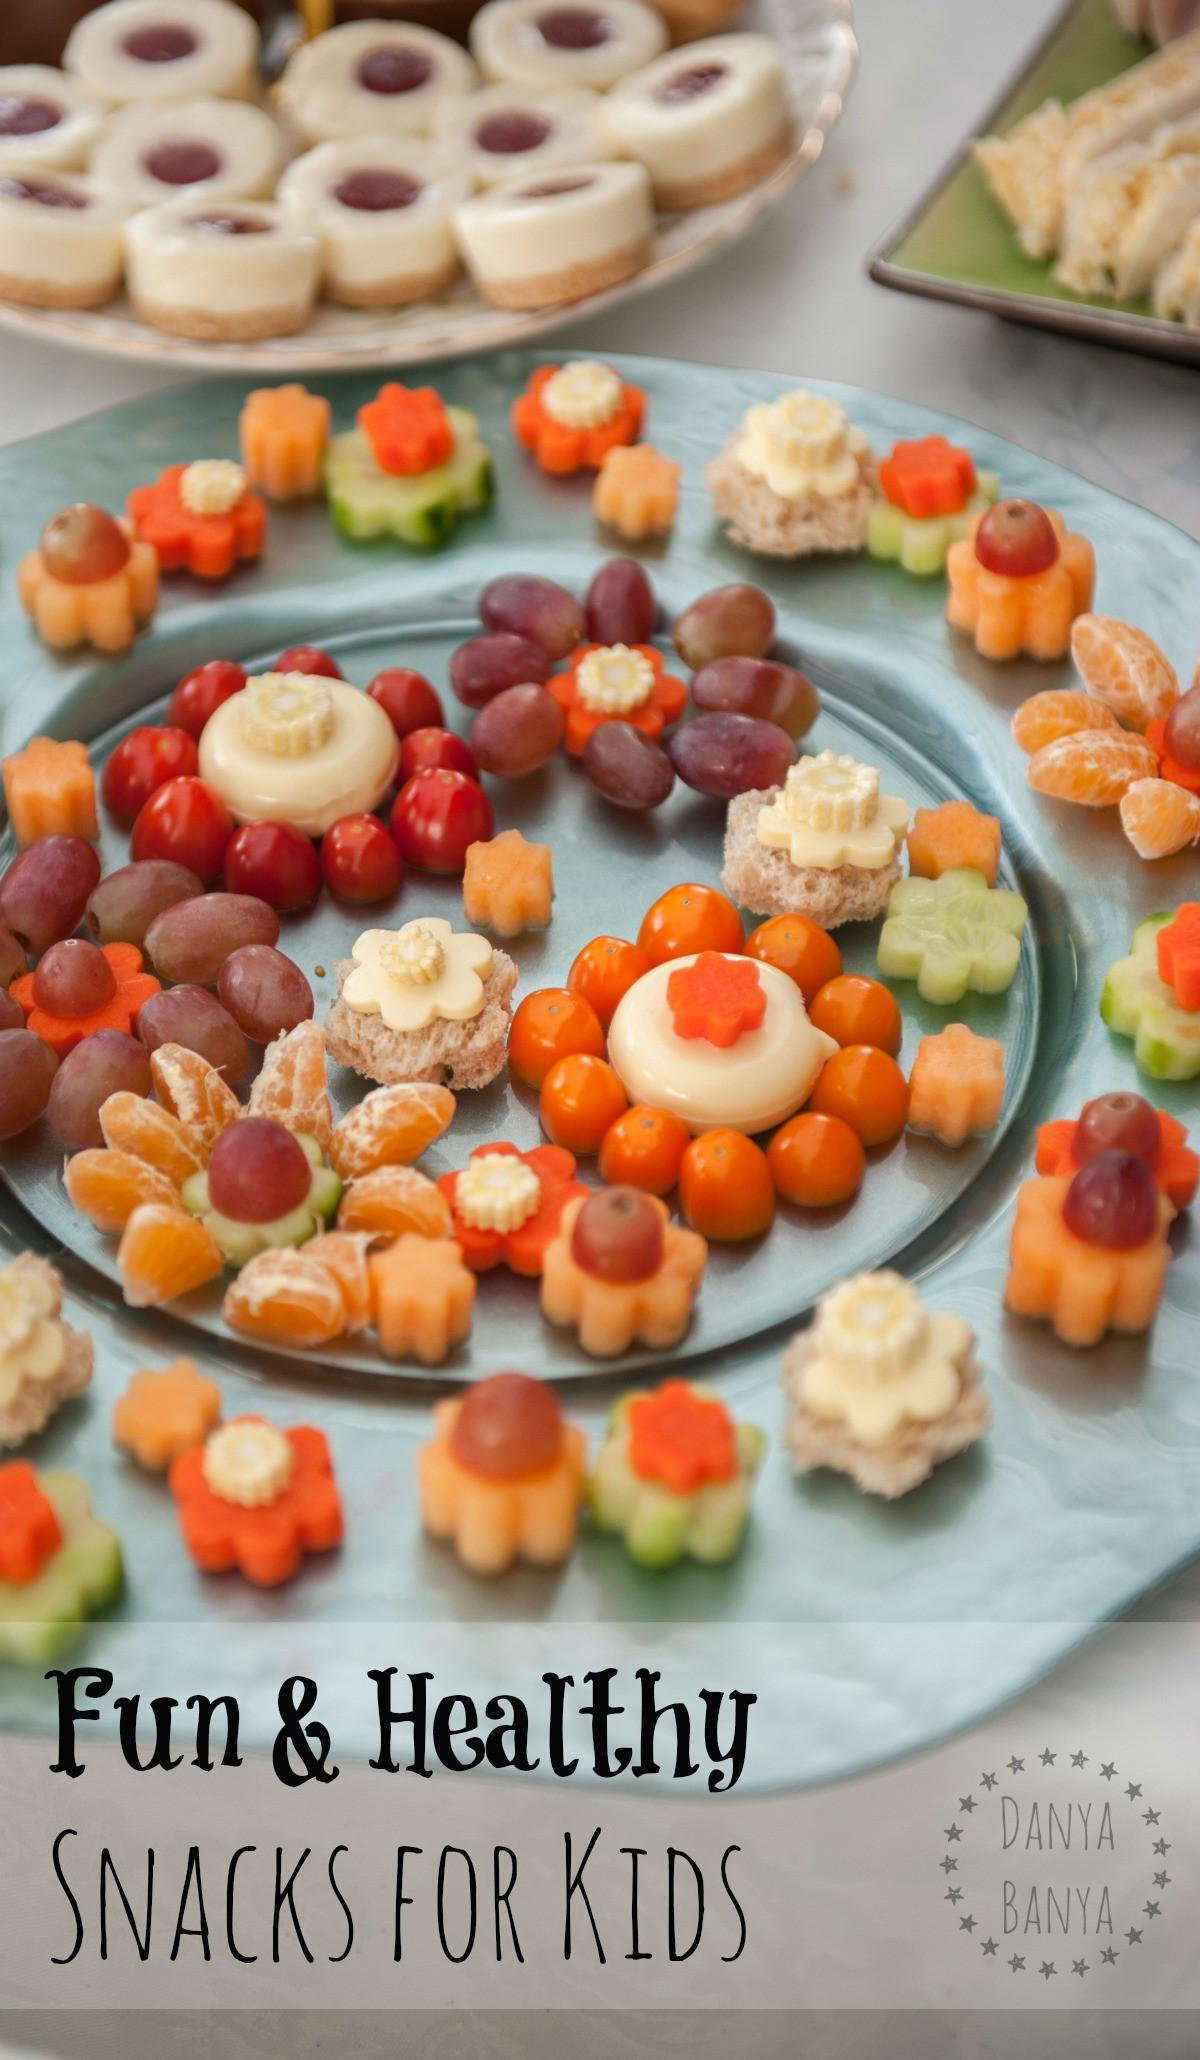 Healthy Snacks For Infants  Fun & Healthy Snacks for Kids – Danya Banya